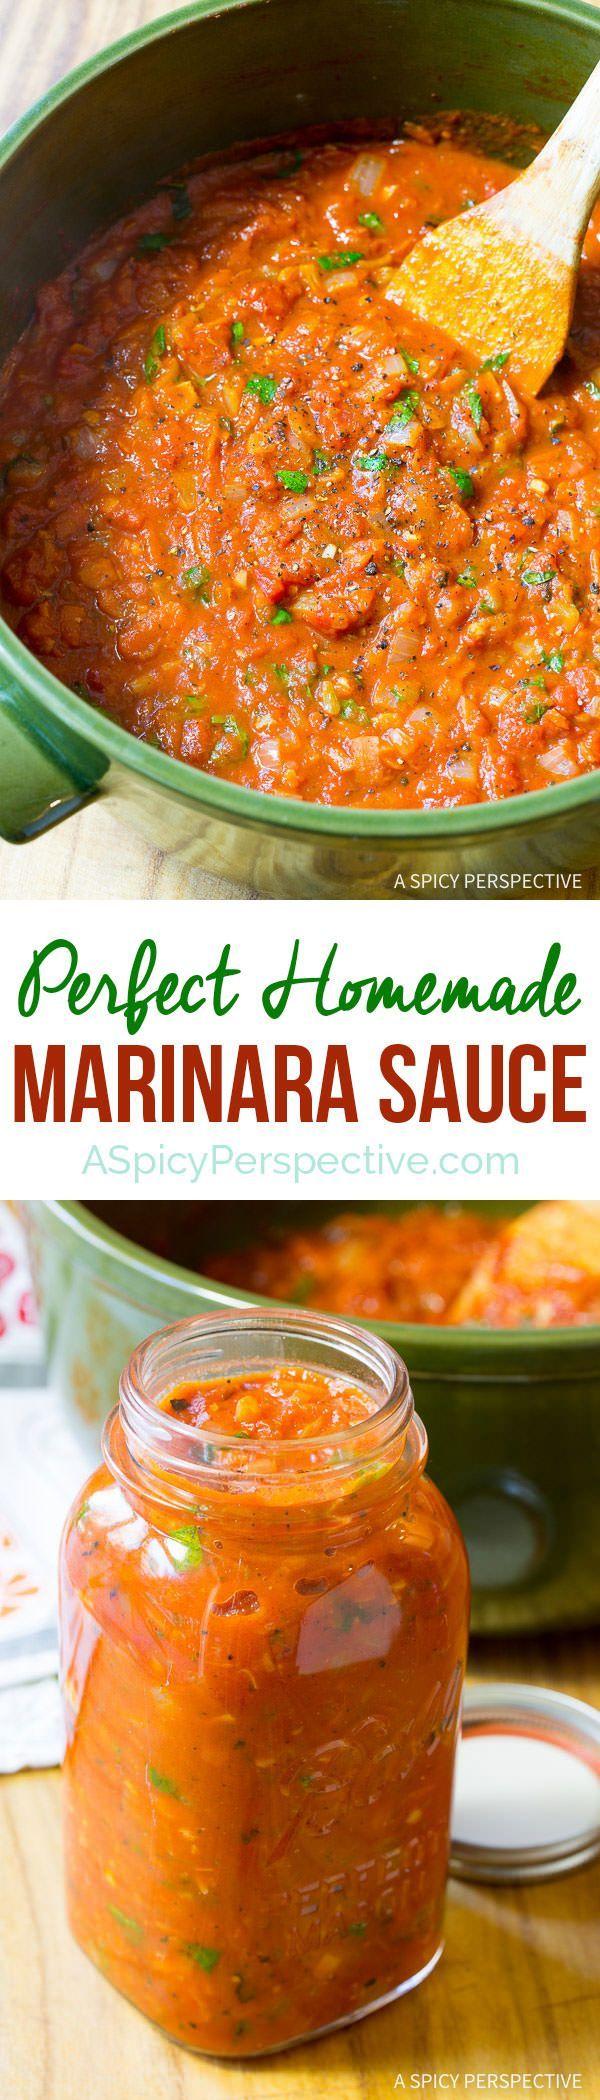 How to Make Marinara Sauce (with Recipe)   http://ASpicyPerspective.com